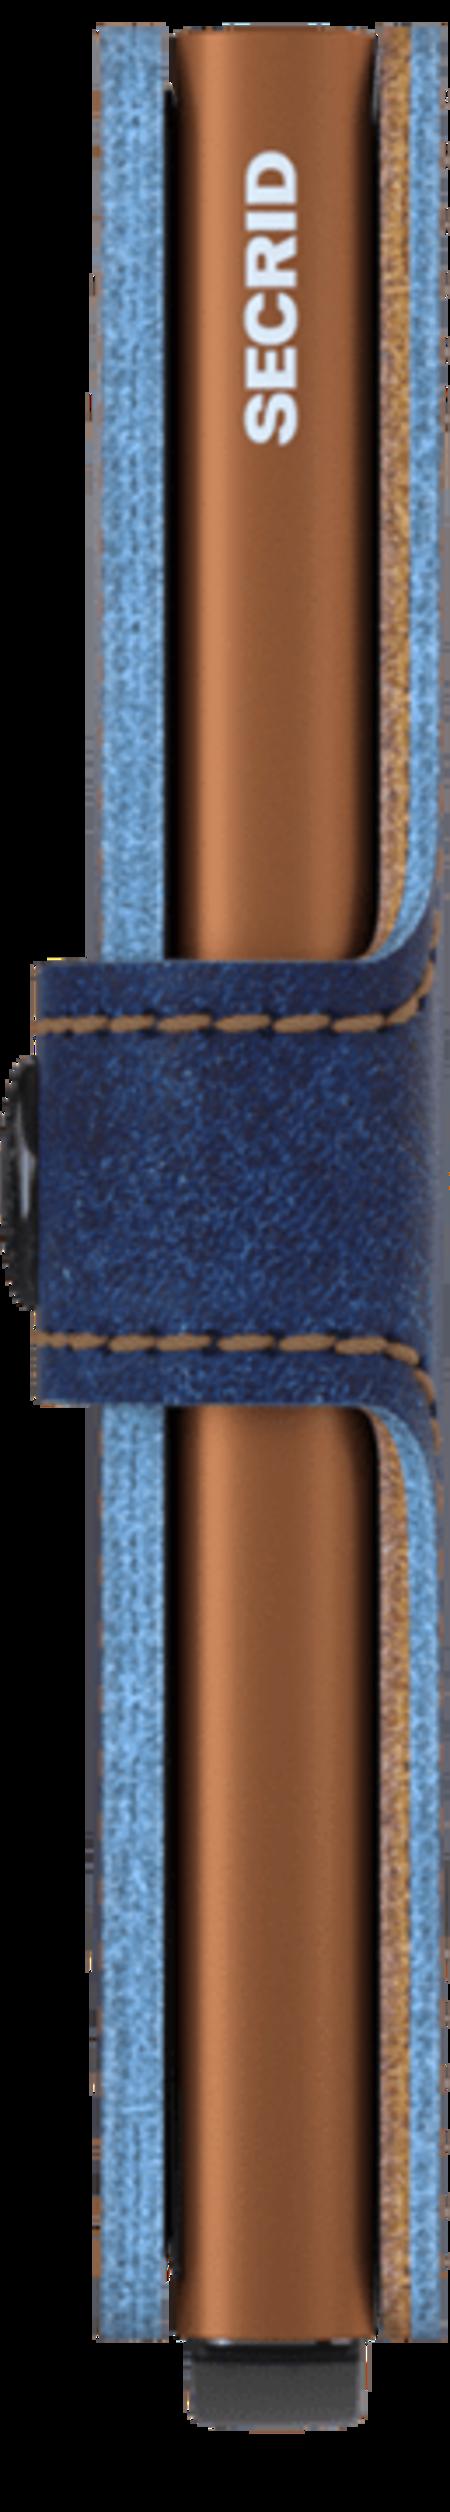 Secrid Miniwallet - Indigo 5